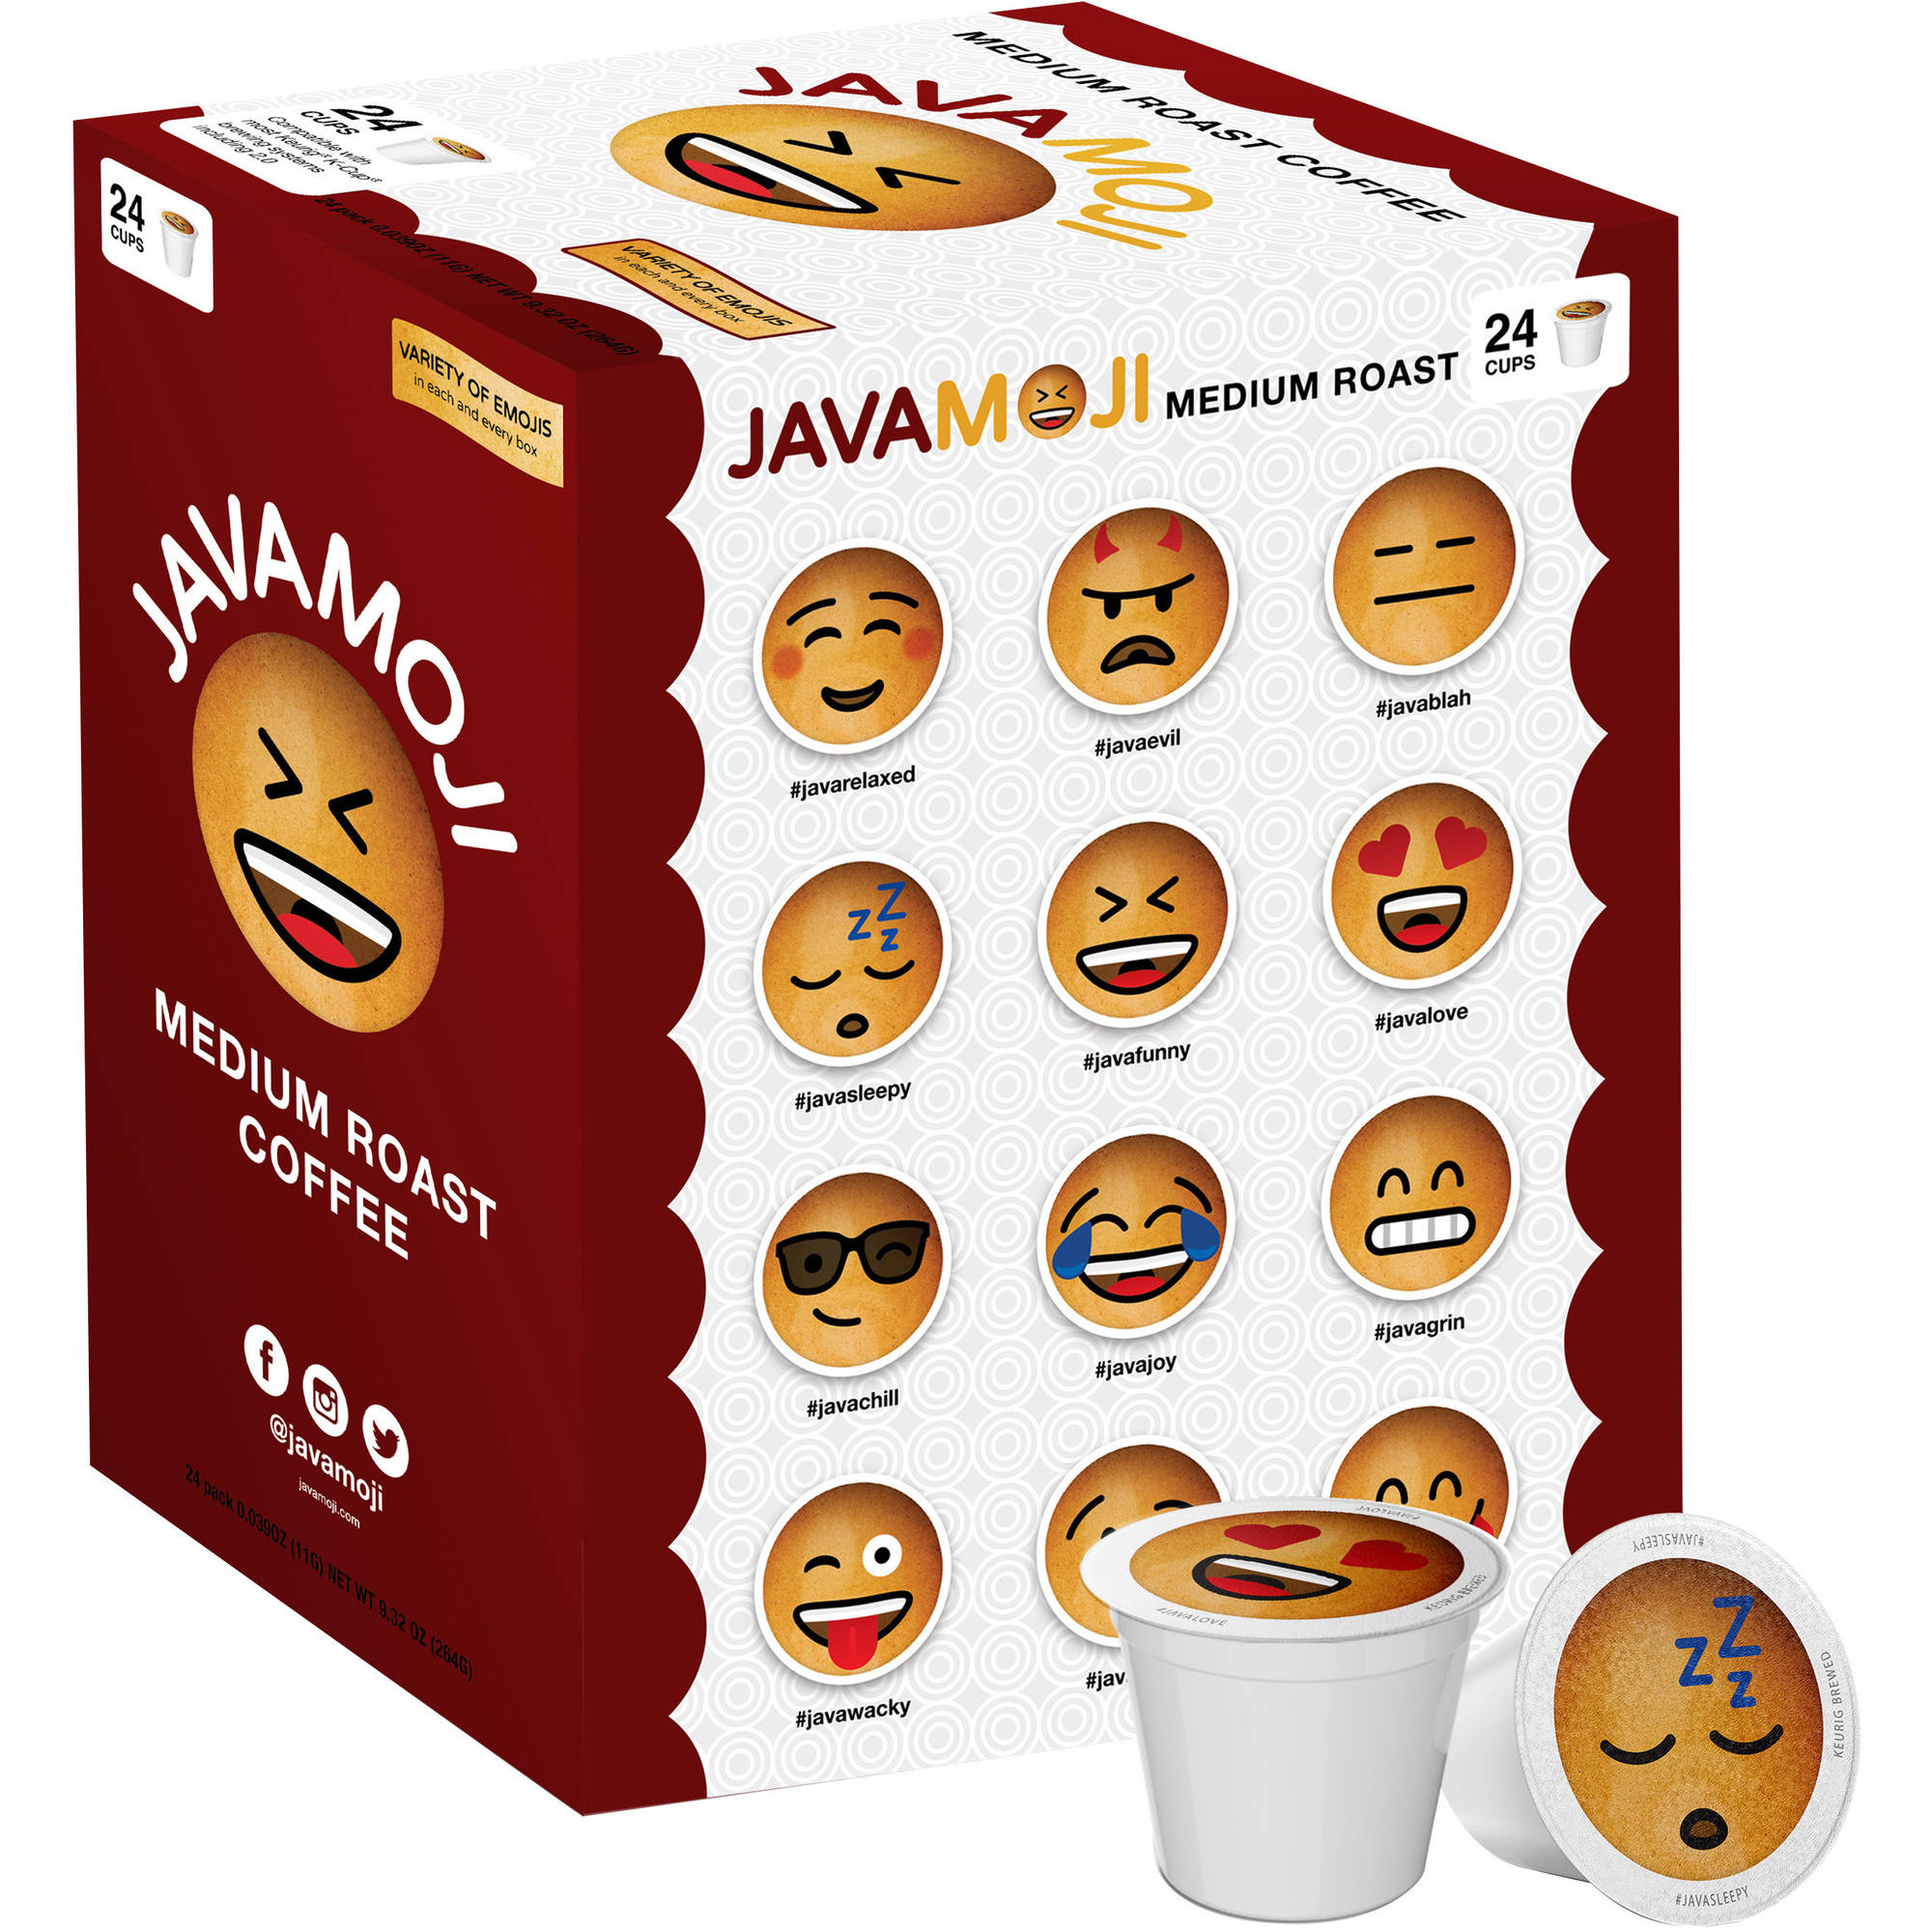 JavaMoji, Emoji K-Cup Pods, Medium Roast Coffee, 24 Count